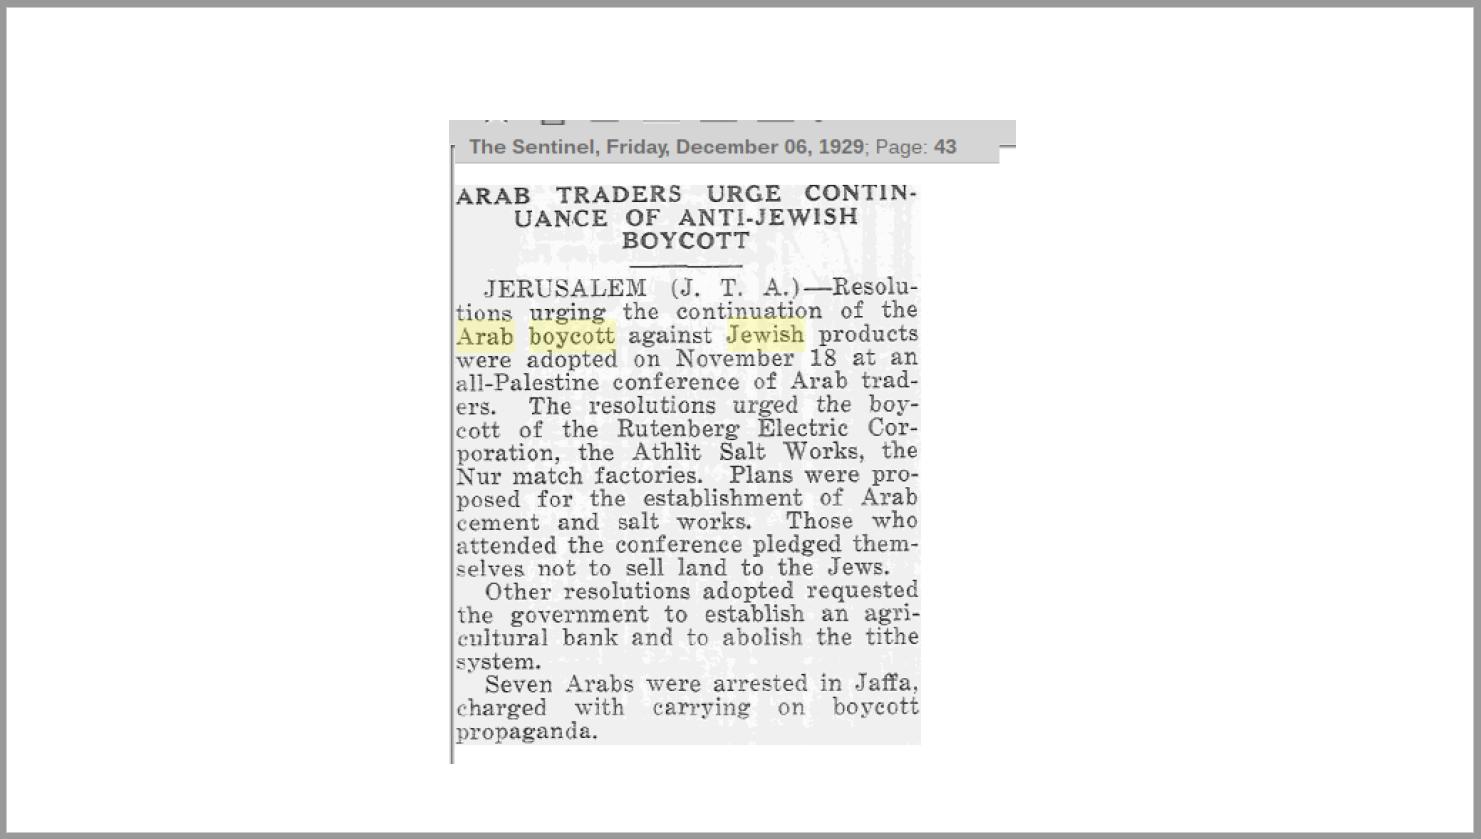 bds-history-slide-1929-boycott